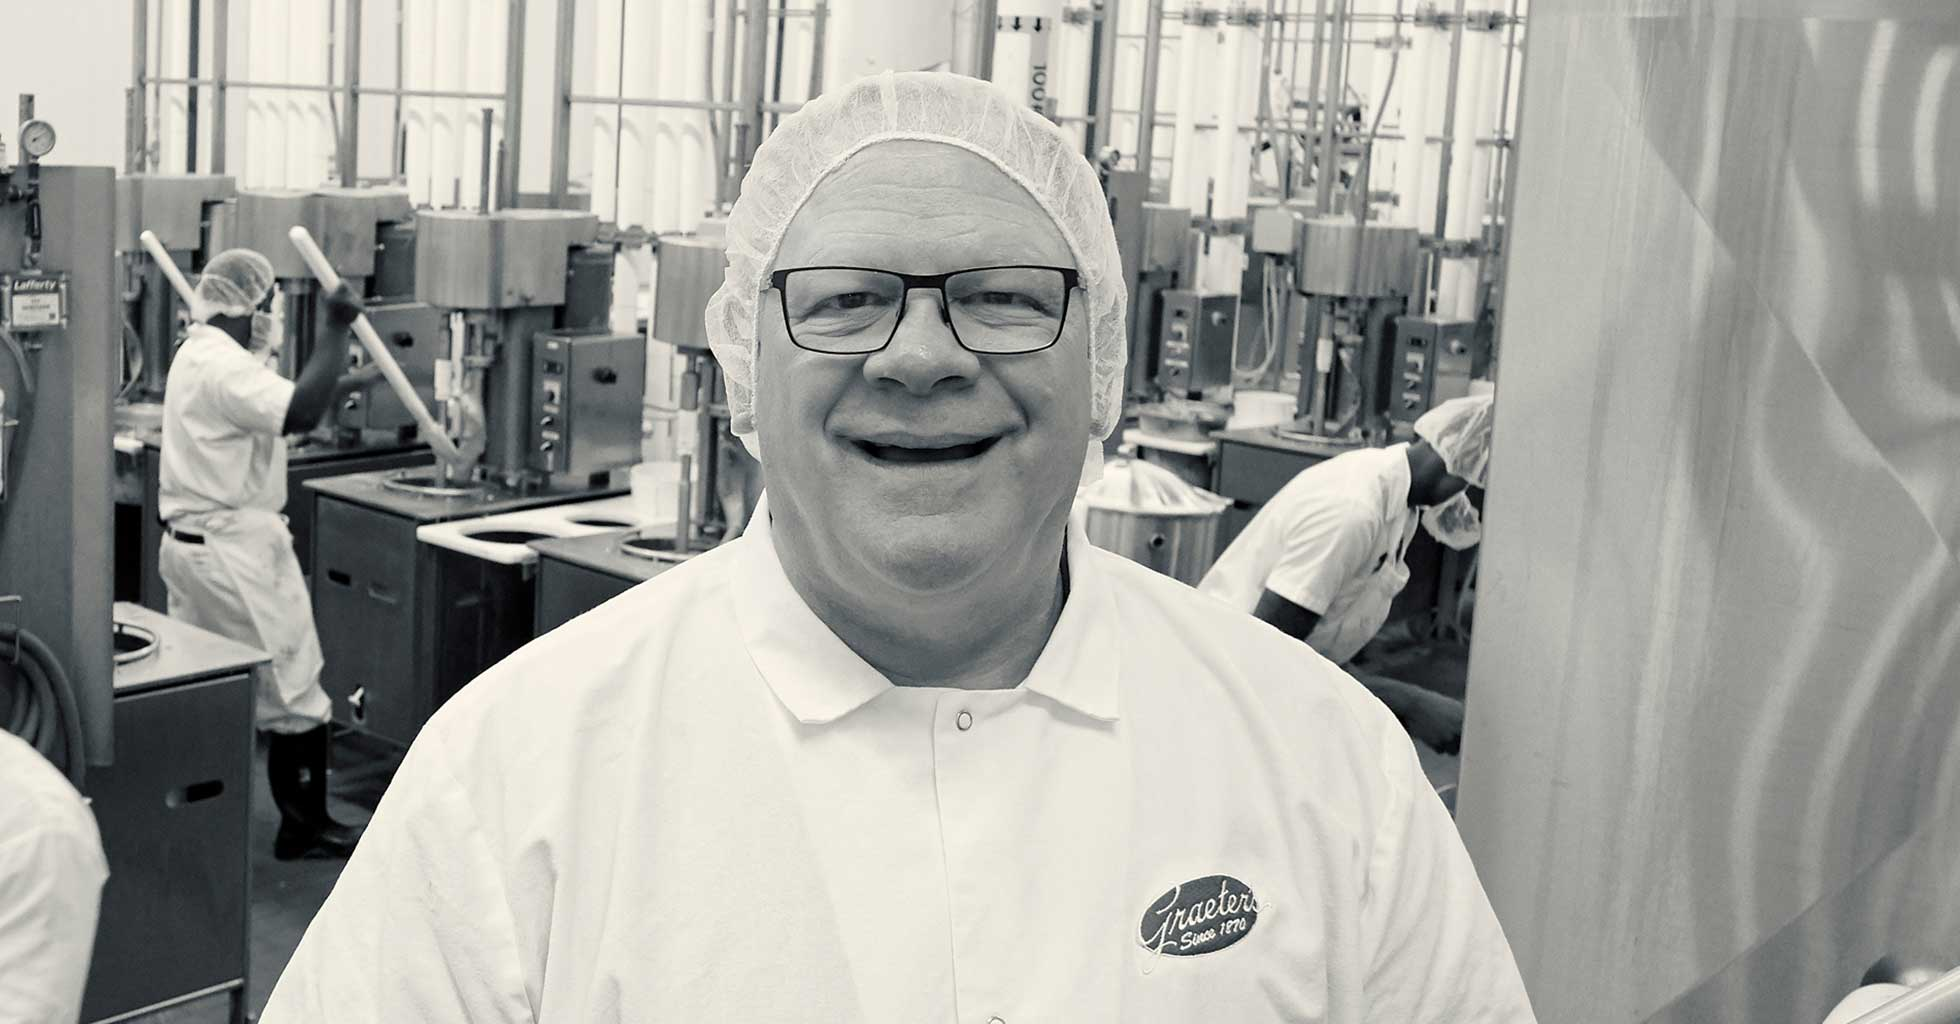 Graeter's Ice Cream Company